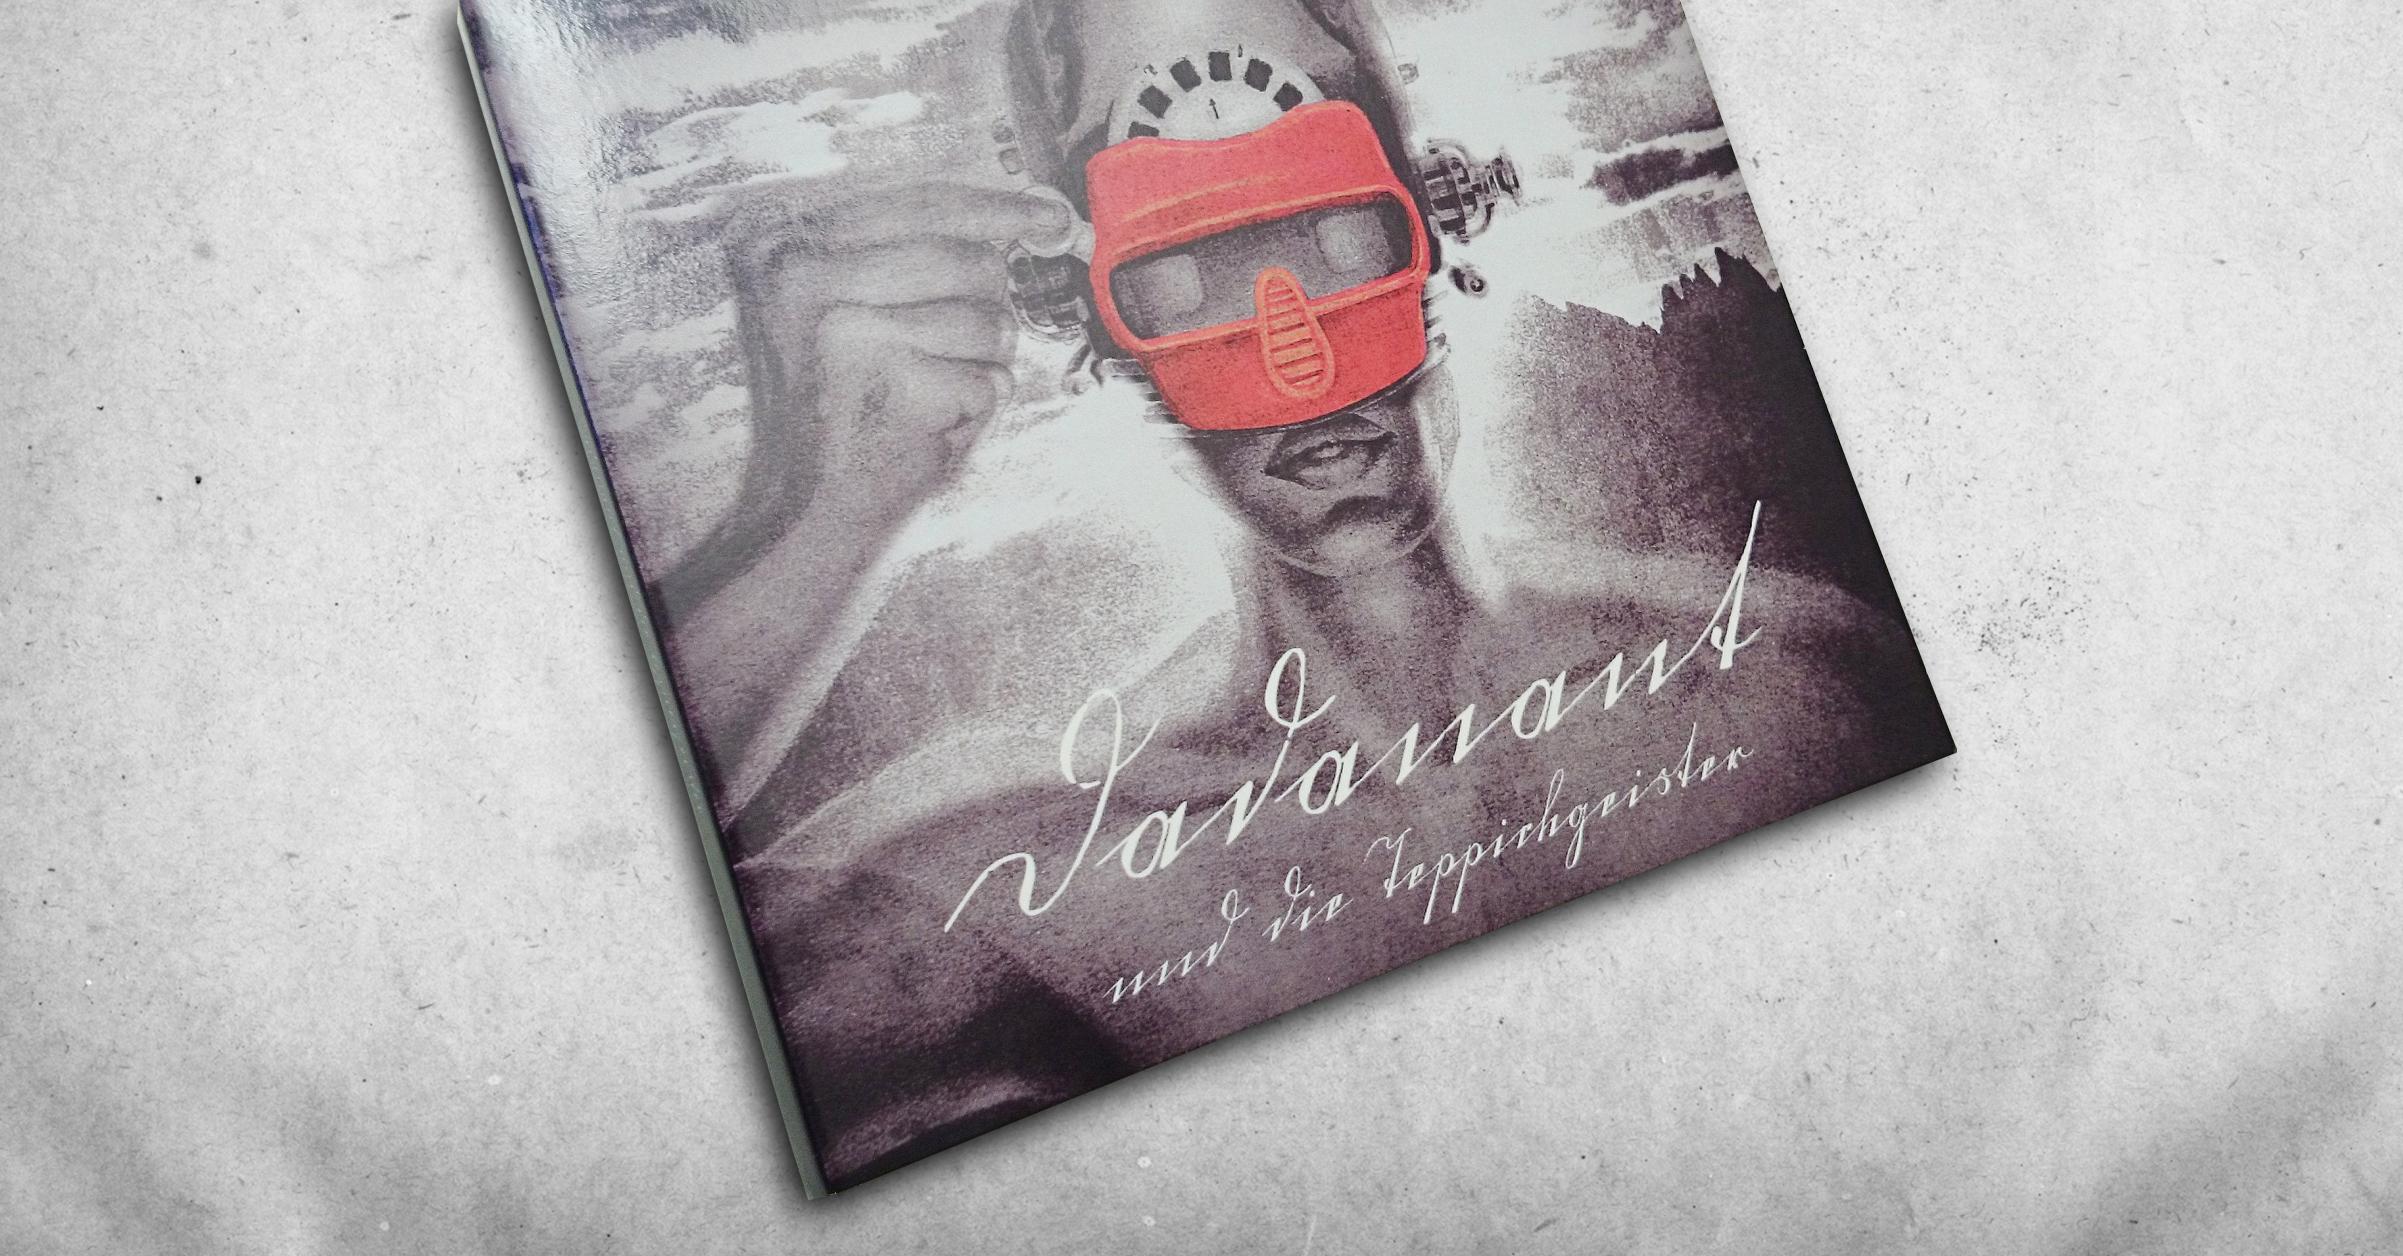 Teppichgeister CD im Pappkarton - 2